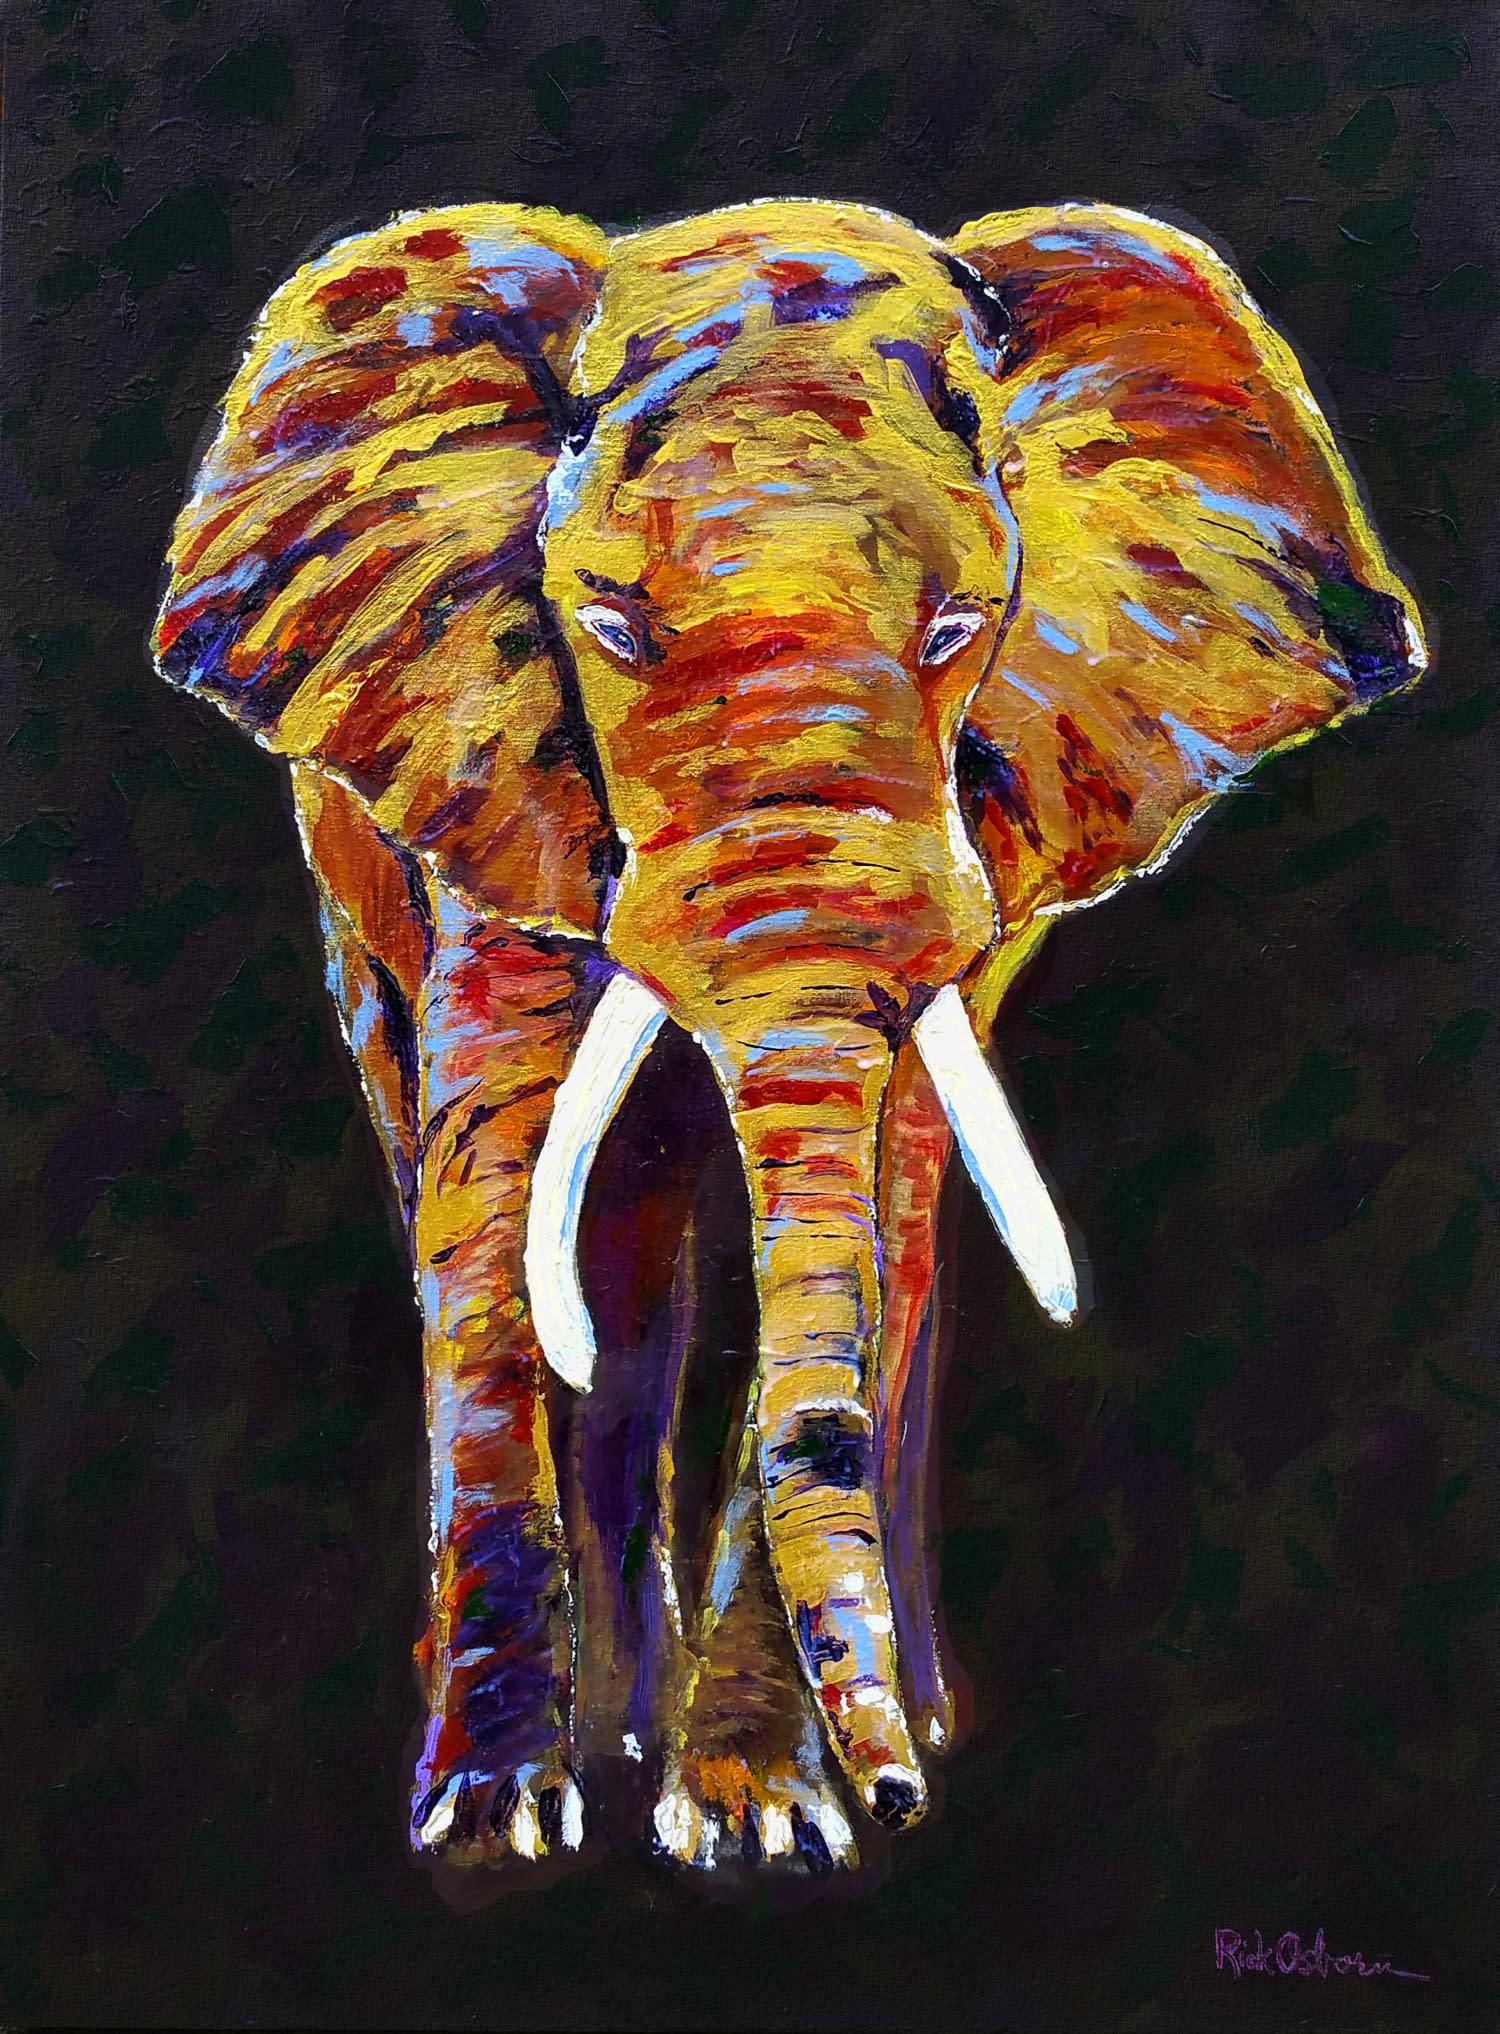 Elephant sm rick osborn q1gp1x